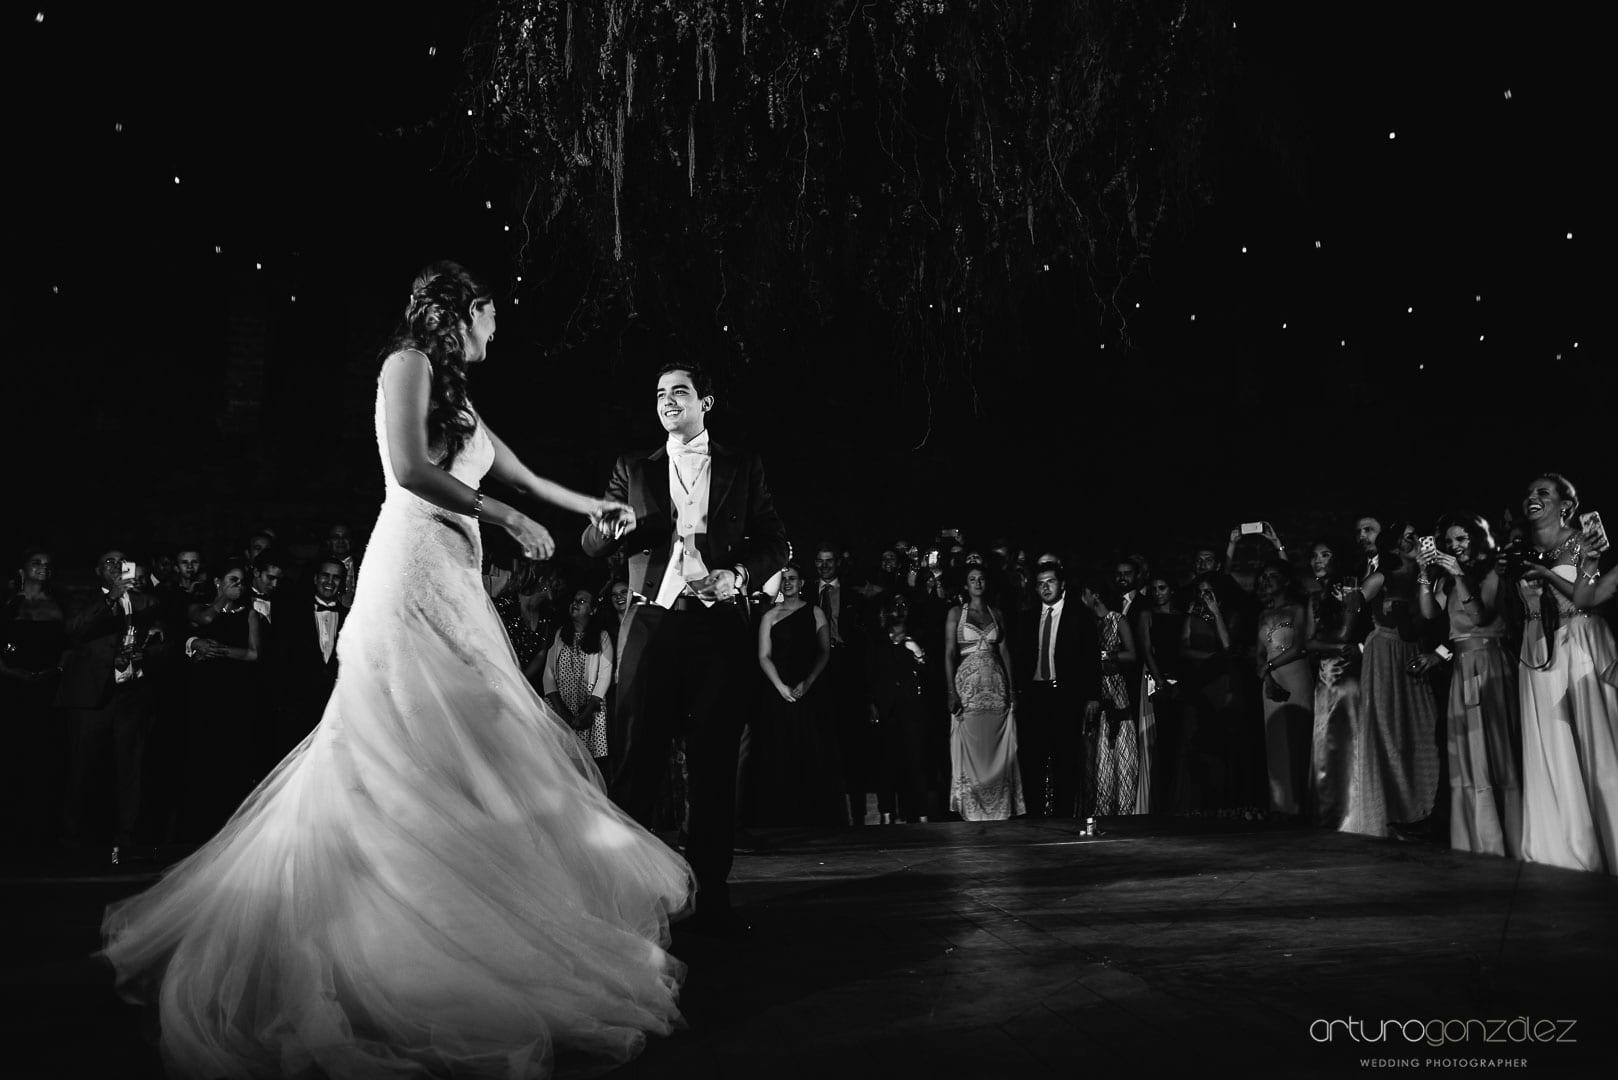 fotografo-de-bodas-en-guanajuato-110